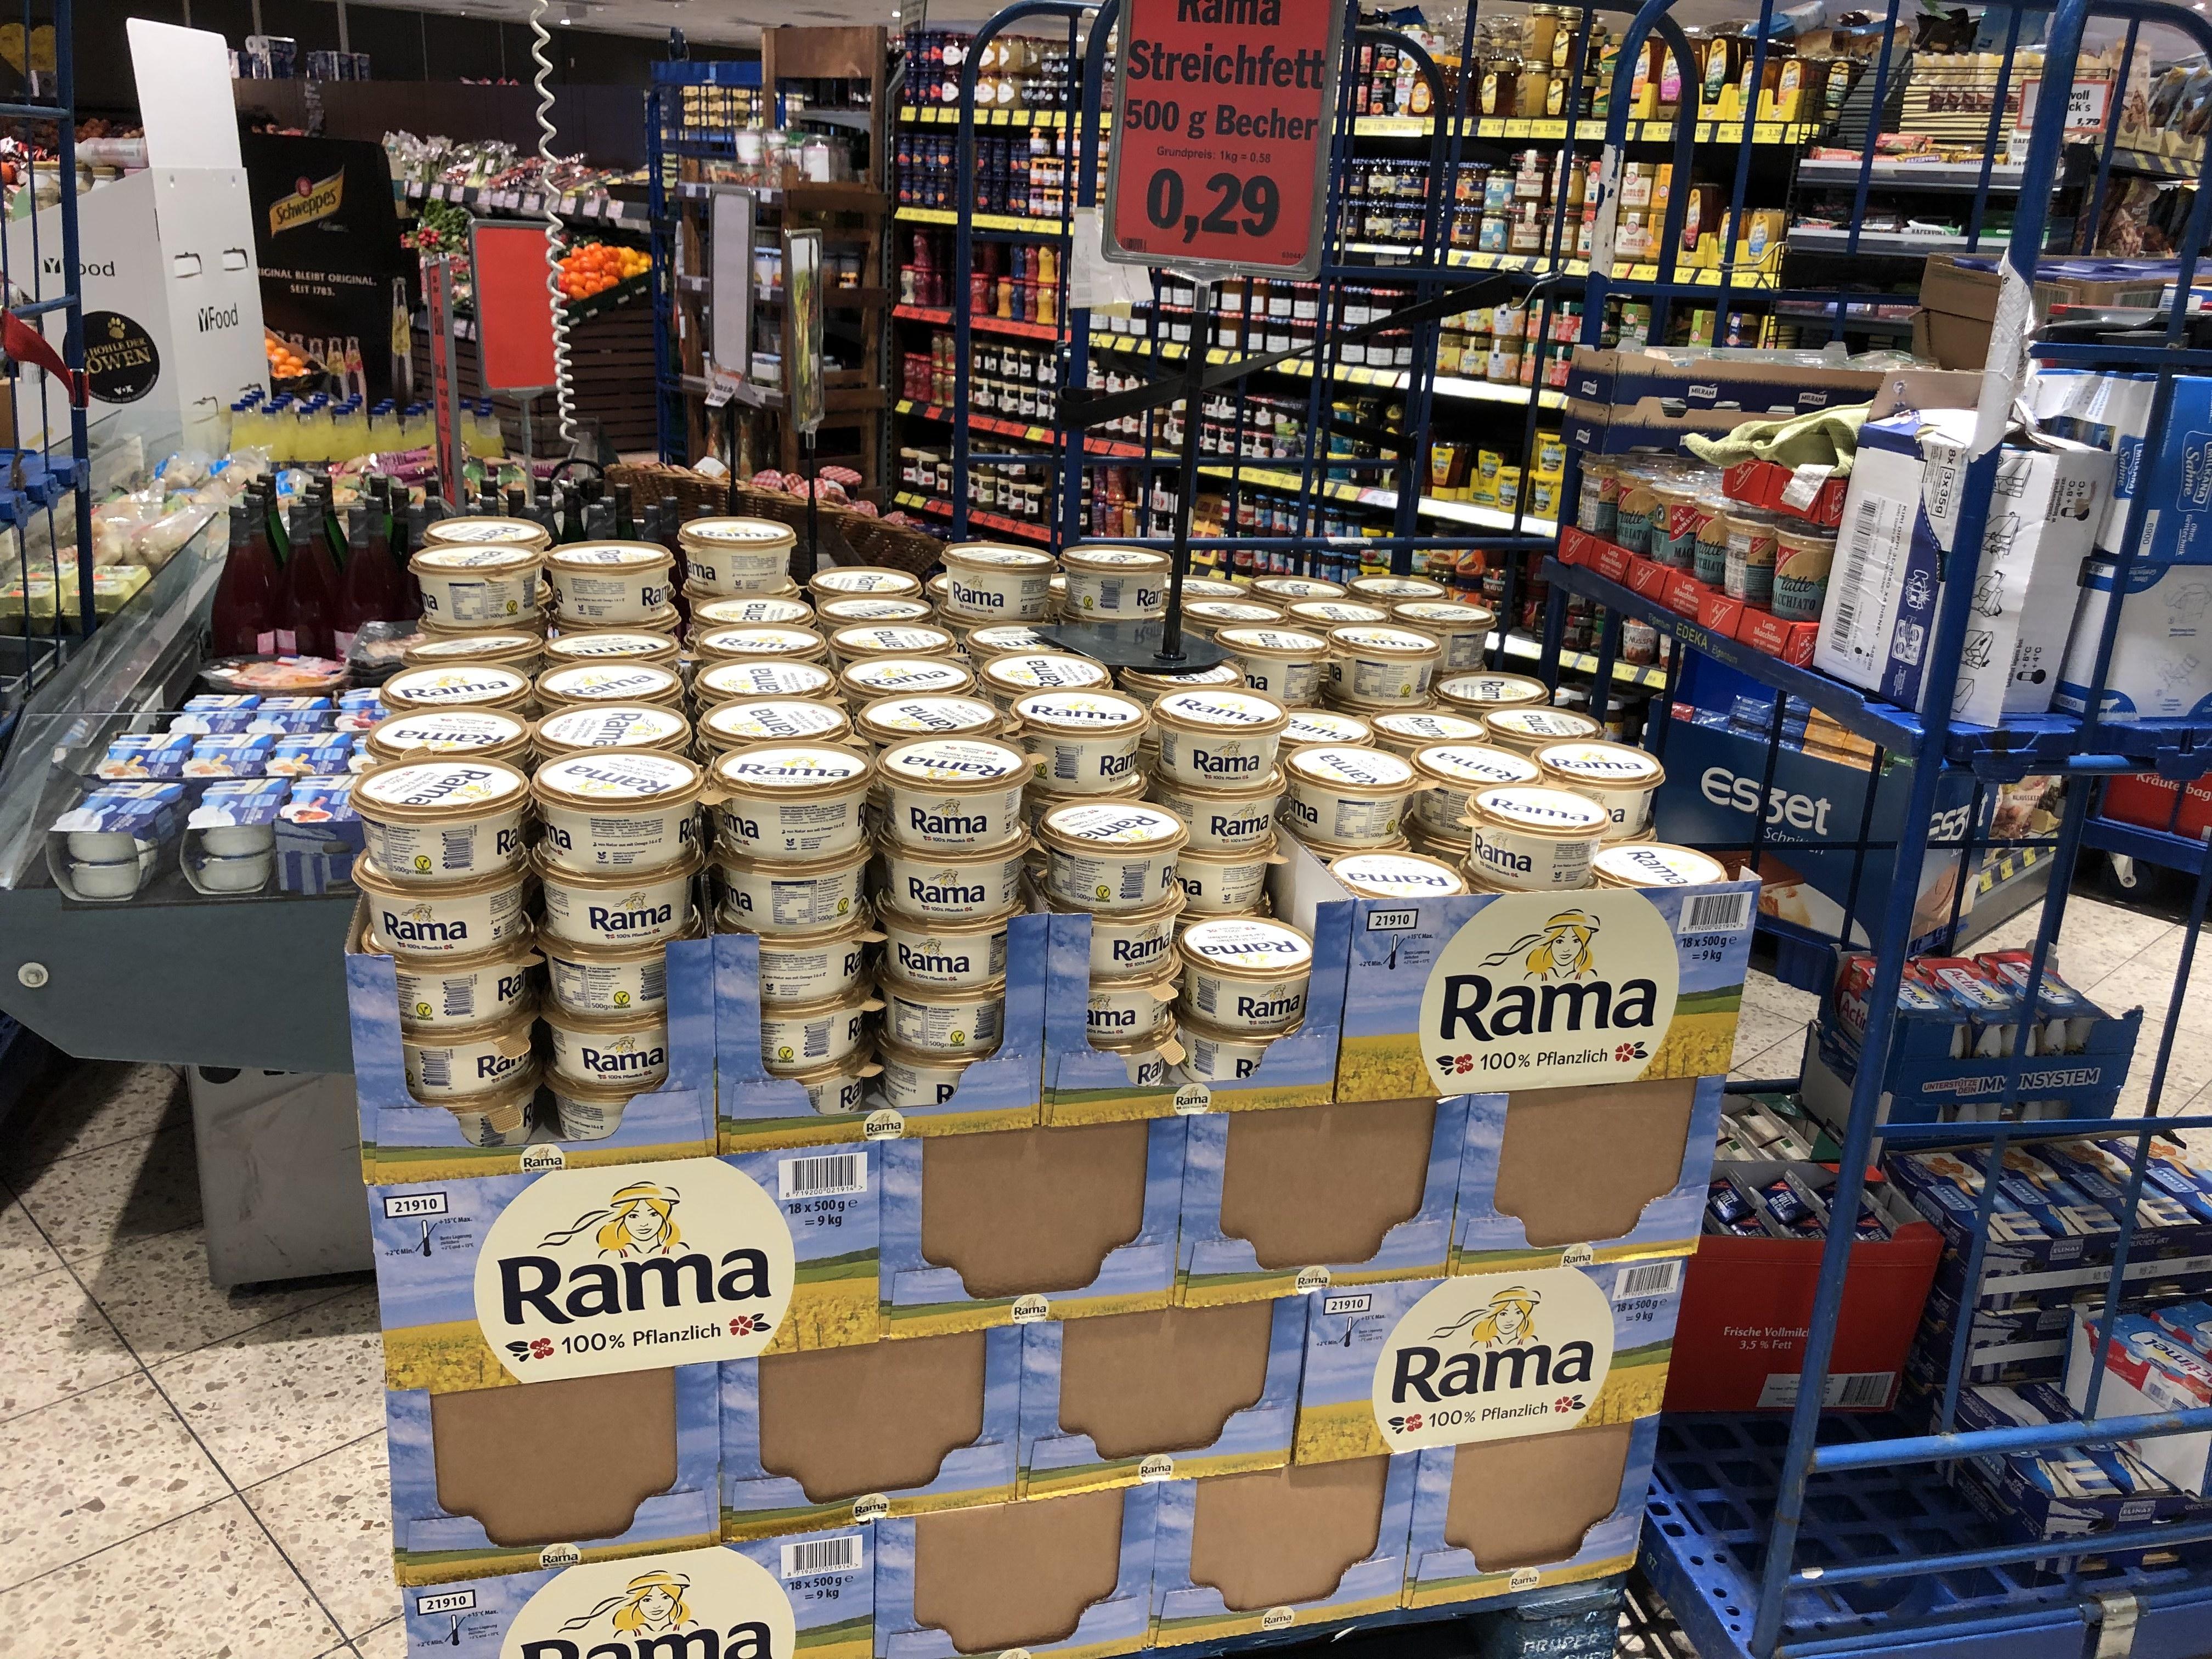 (Lokal)Rama Margarine kurzes MHD (15.09.2019) in STOLBERG